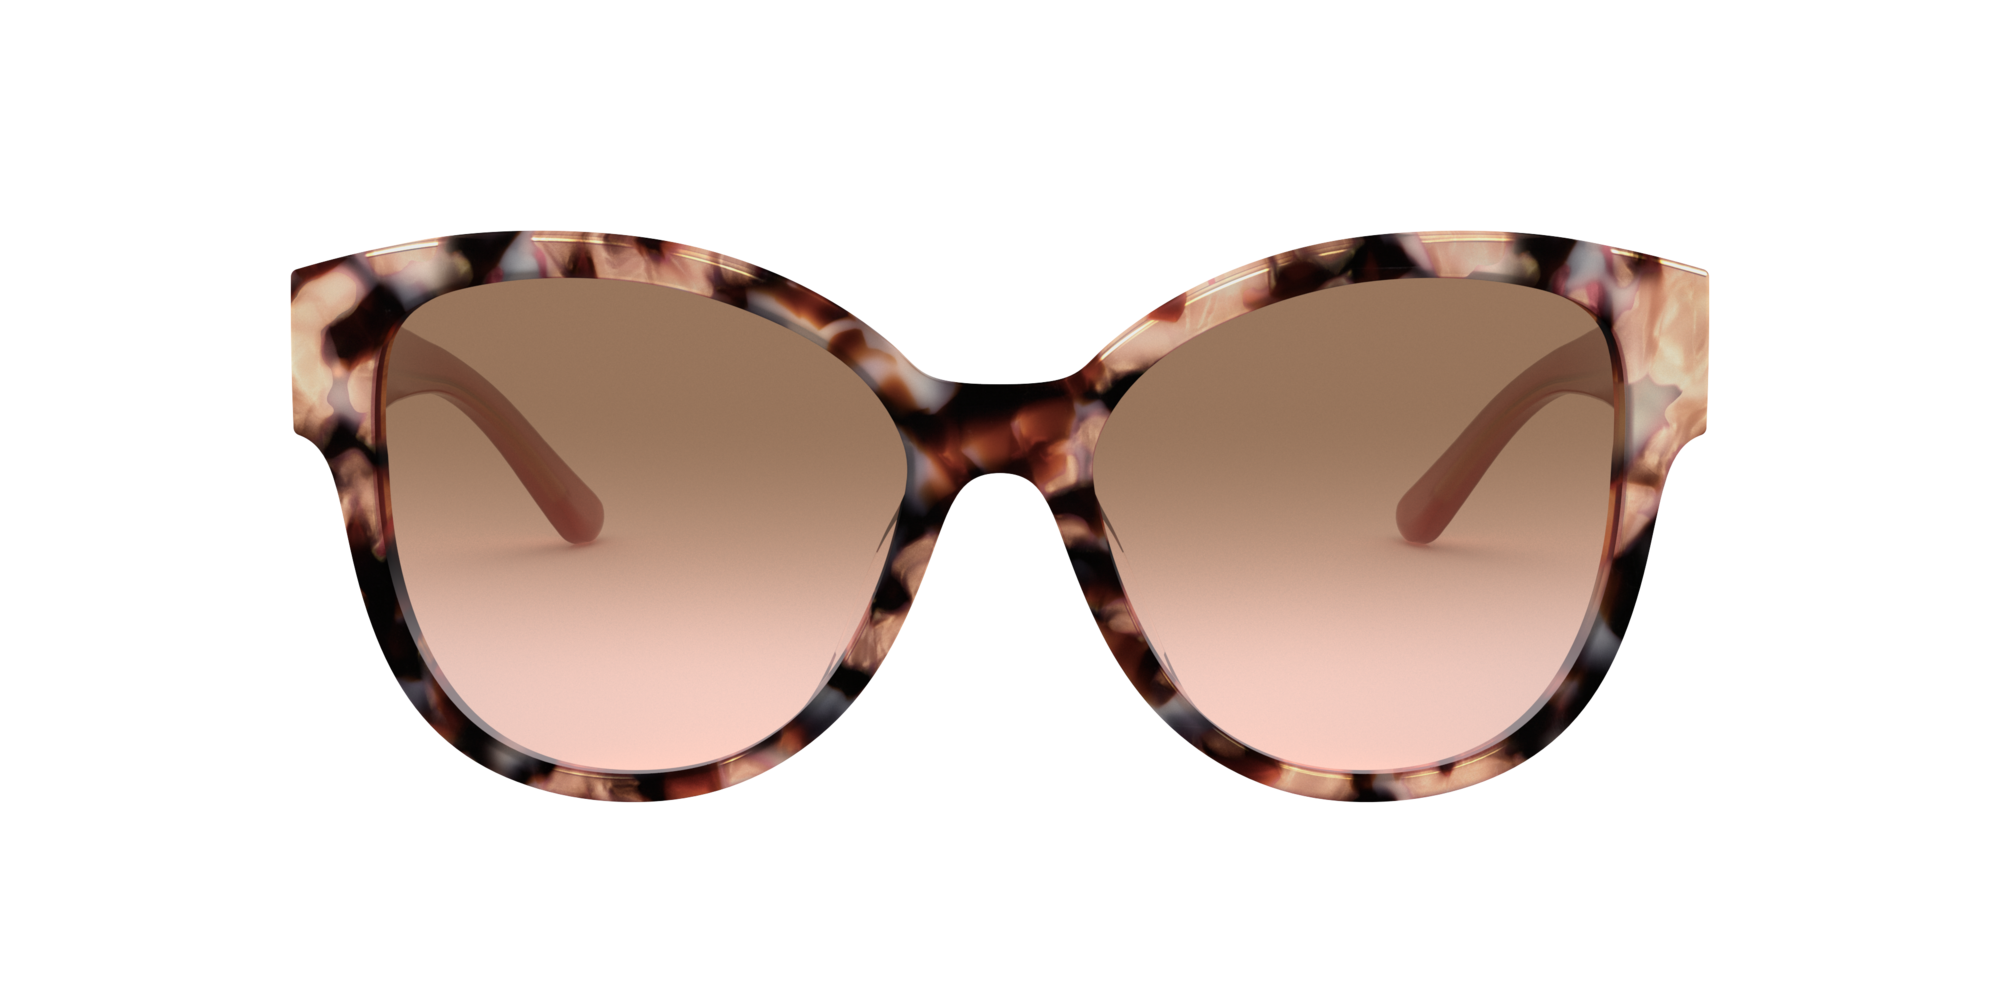 Image for TY7155U from LensCrafters | Glasses, Prescription Glasses Online, Eyewear